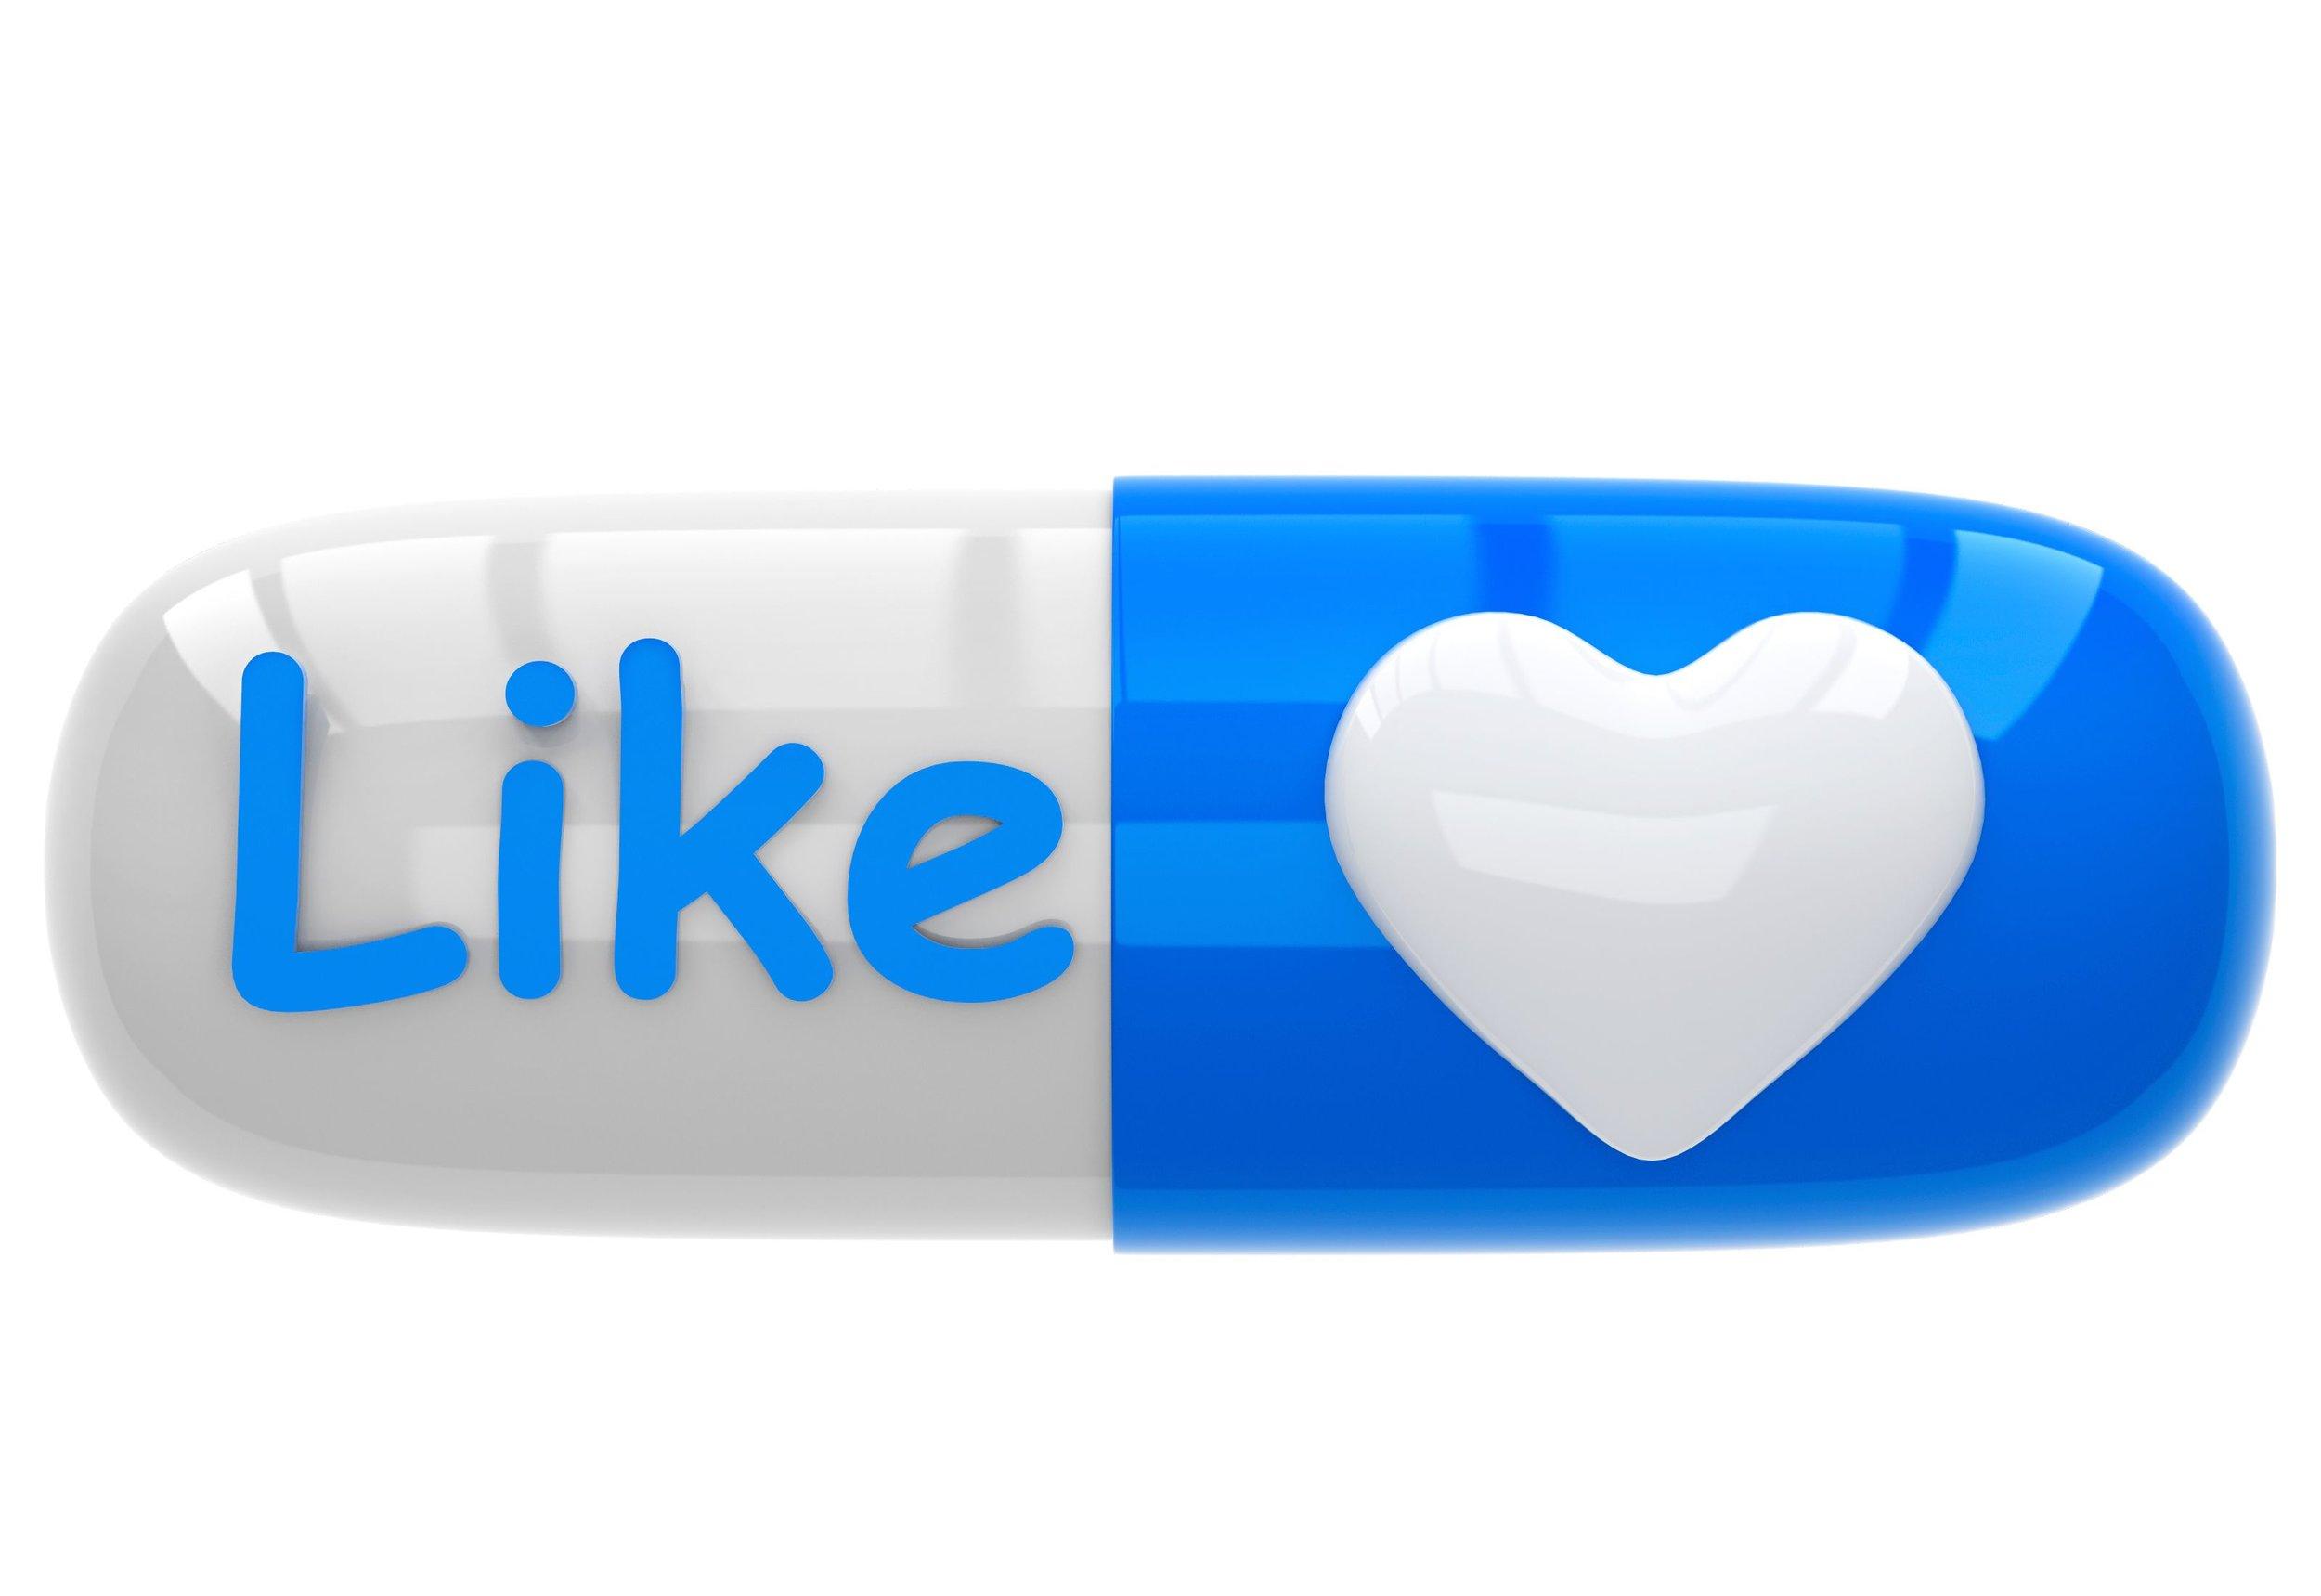 Inscription like and heart on pill capsule HealthCare Medicine Social Media.jpeg